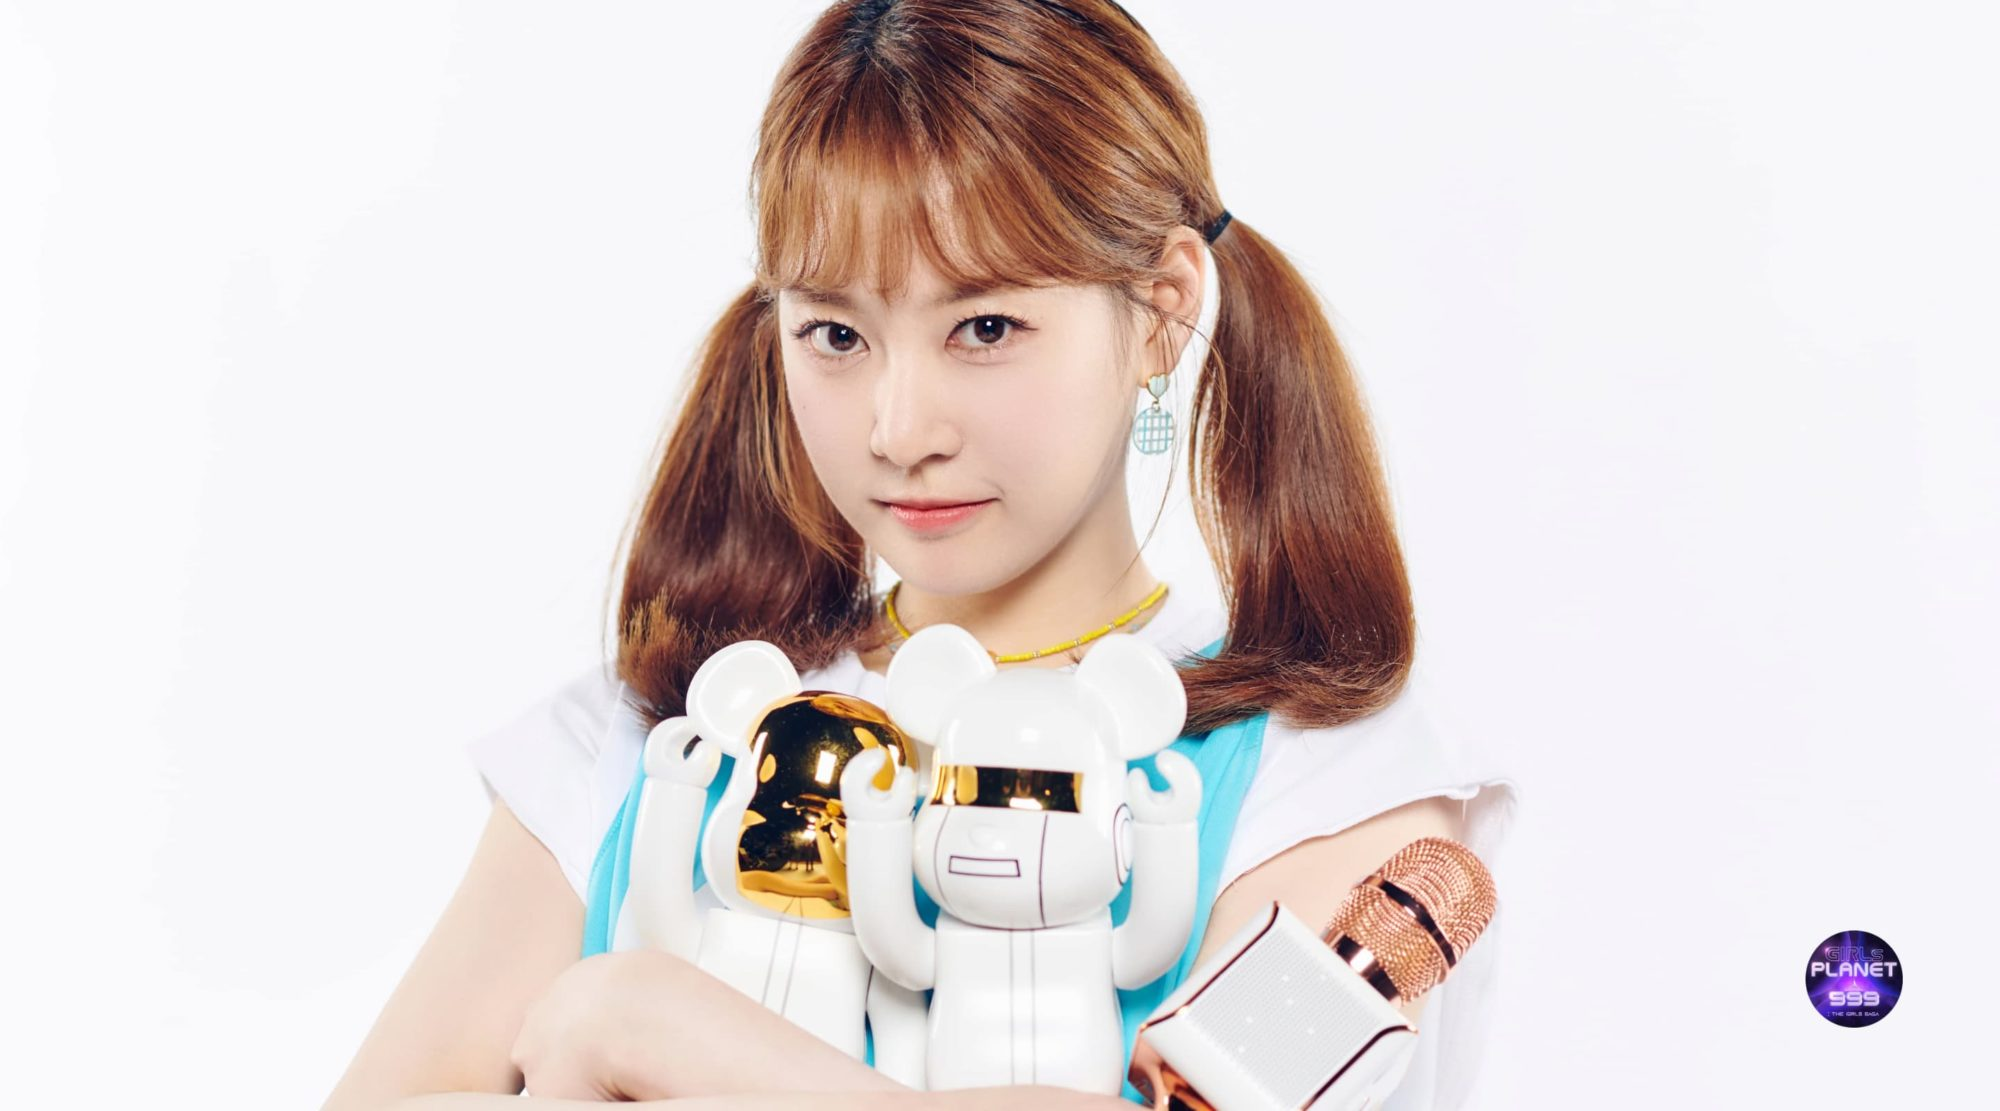 Kim Bora Girls Planet 999